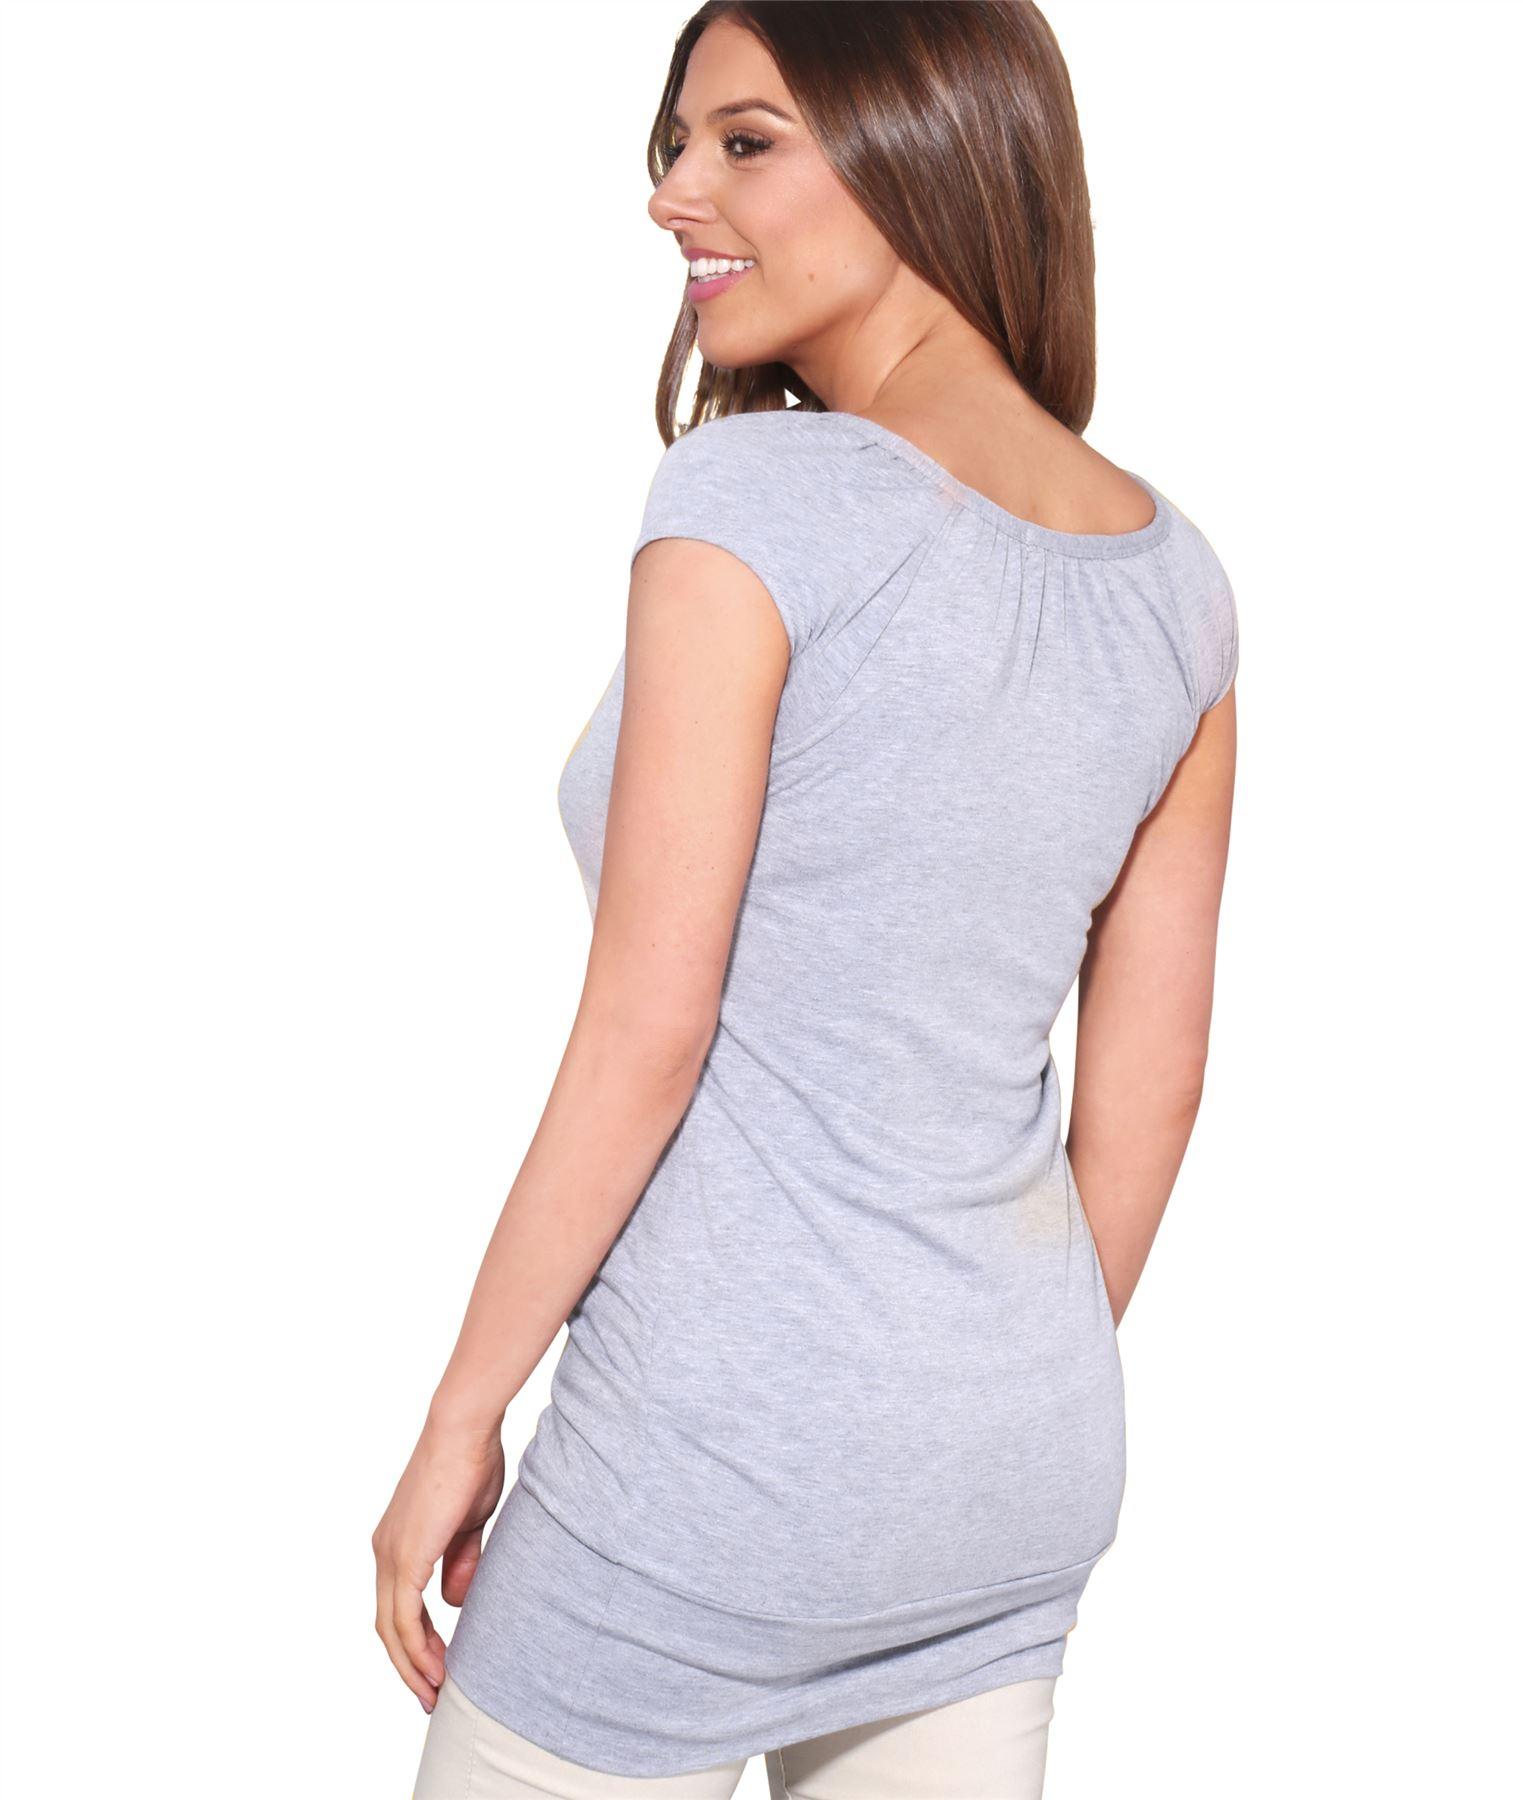 Womens-Ladies-Scoop-Neck-Blouse-V-T-Shirt-Long-Short-Sleeve-Plain-Loose-Top thumbnail 20